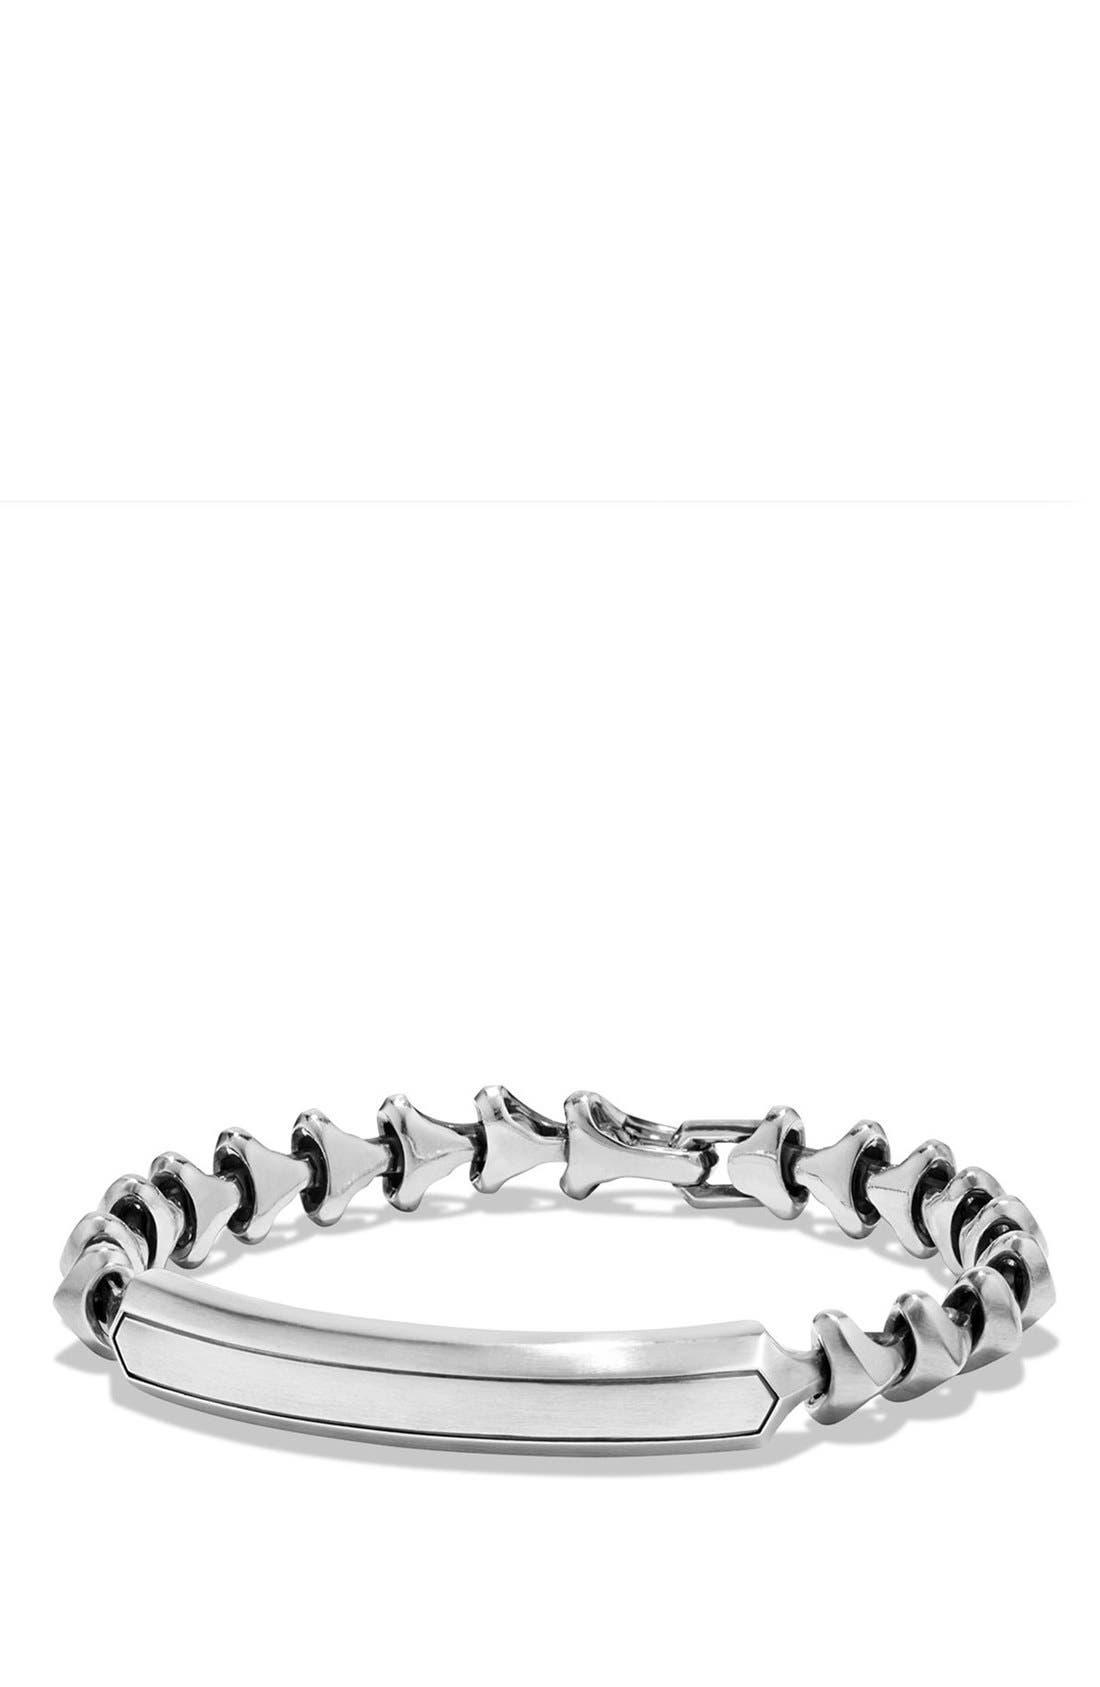 David Yurman 'Armory' Single Row ID Bracelet